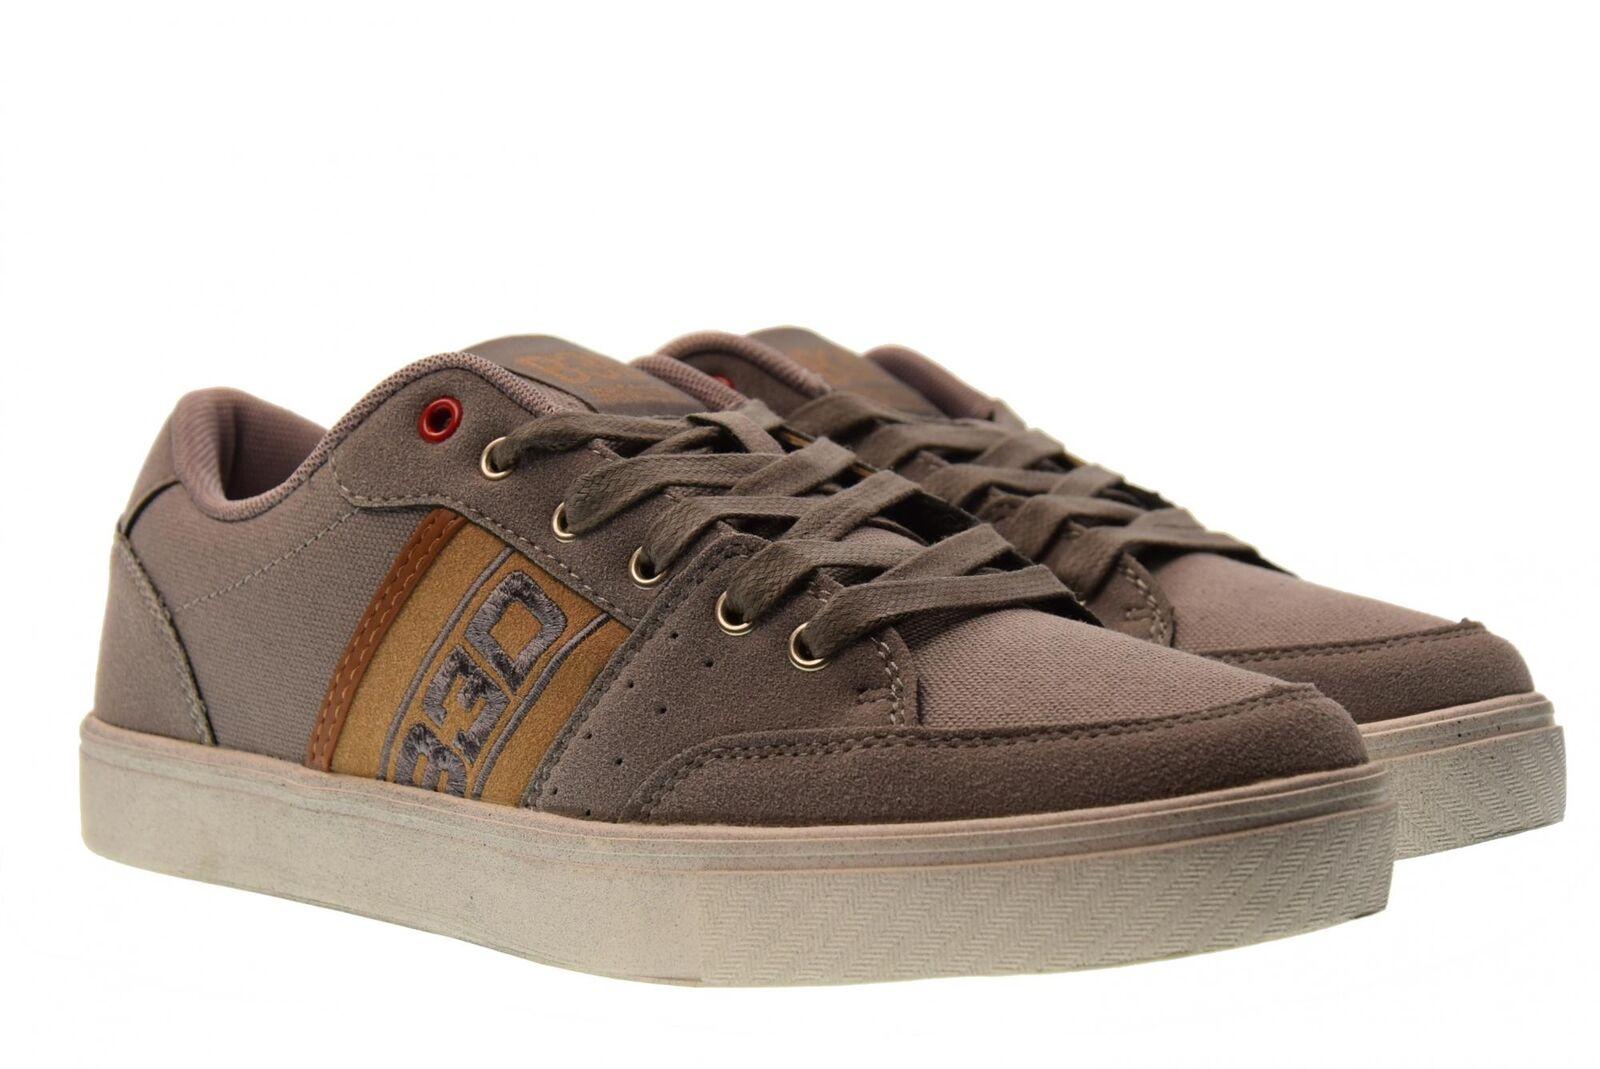 B3D Shoes Schuhe Männer niedrige Turnschuhe 40182 GRAU P18g